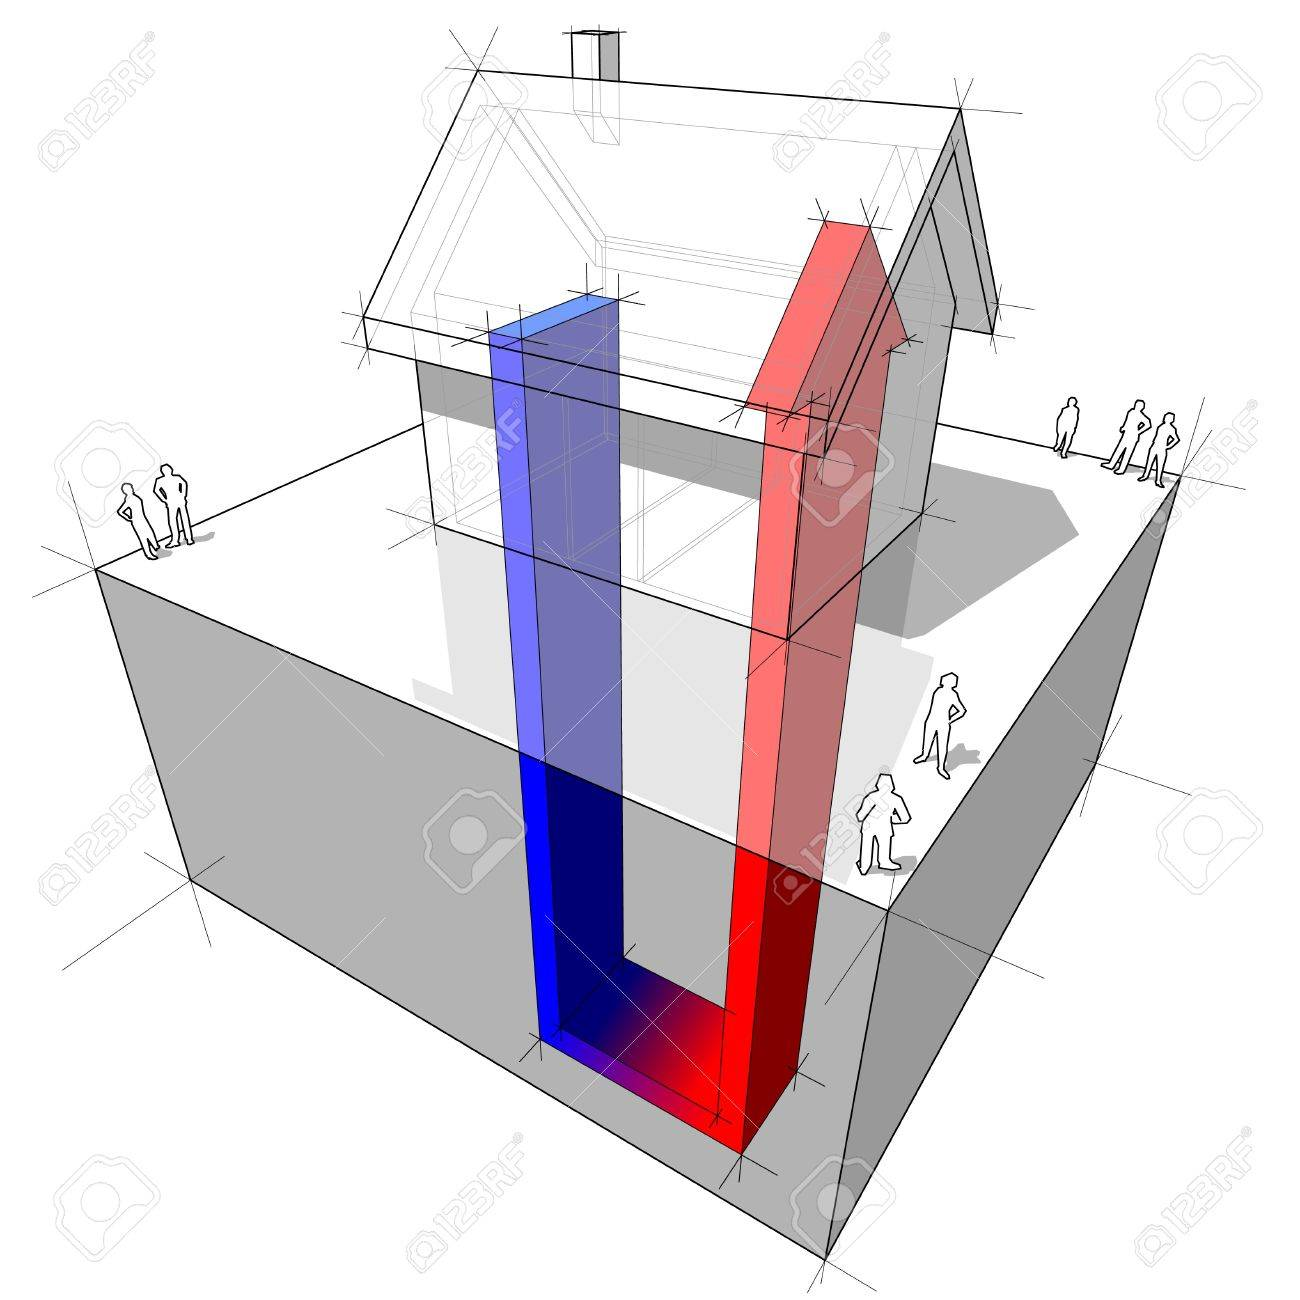 hight resolution of geothermal heat pump diagram stock vector 9930076